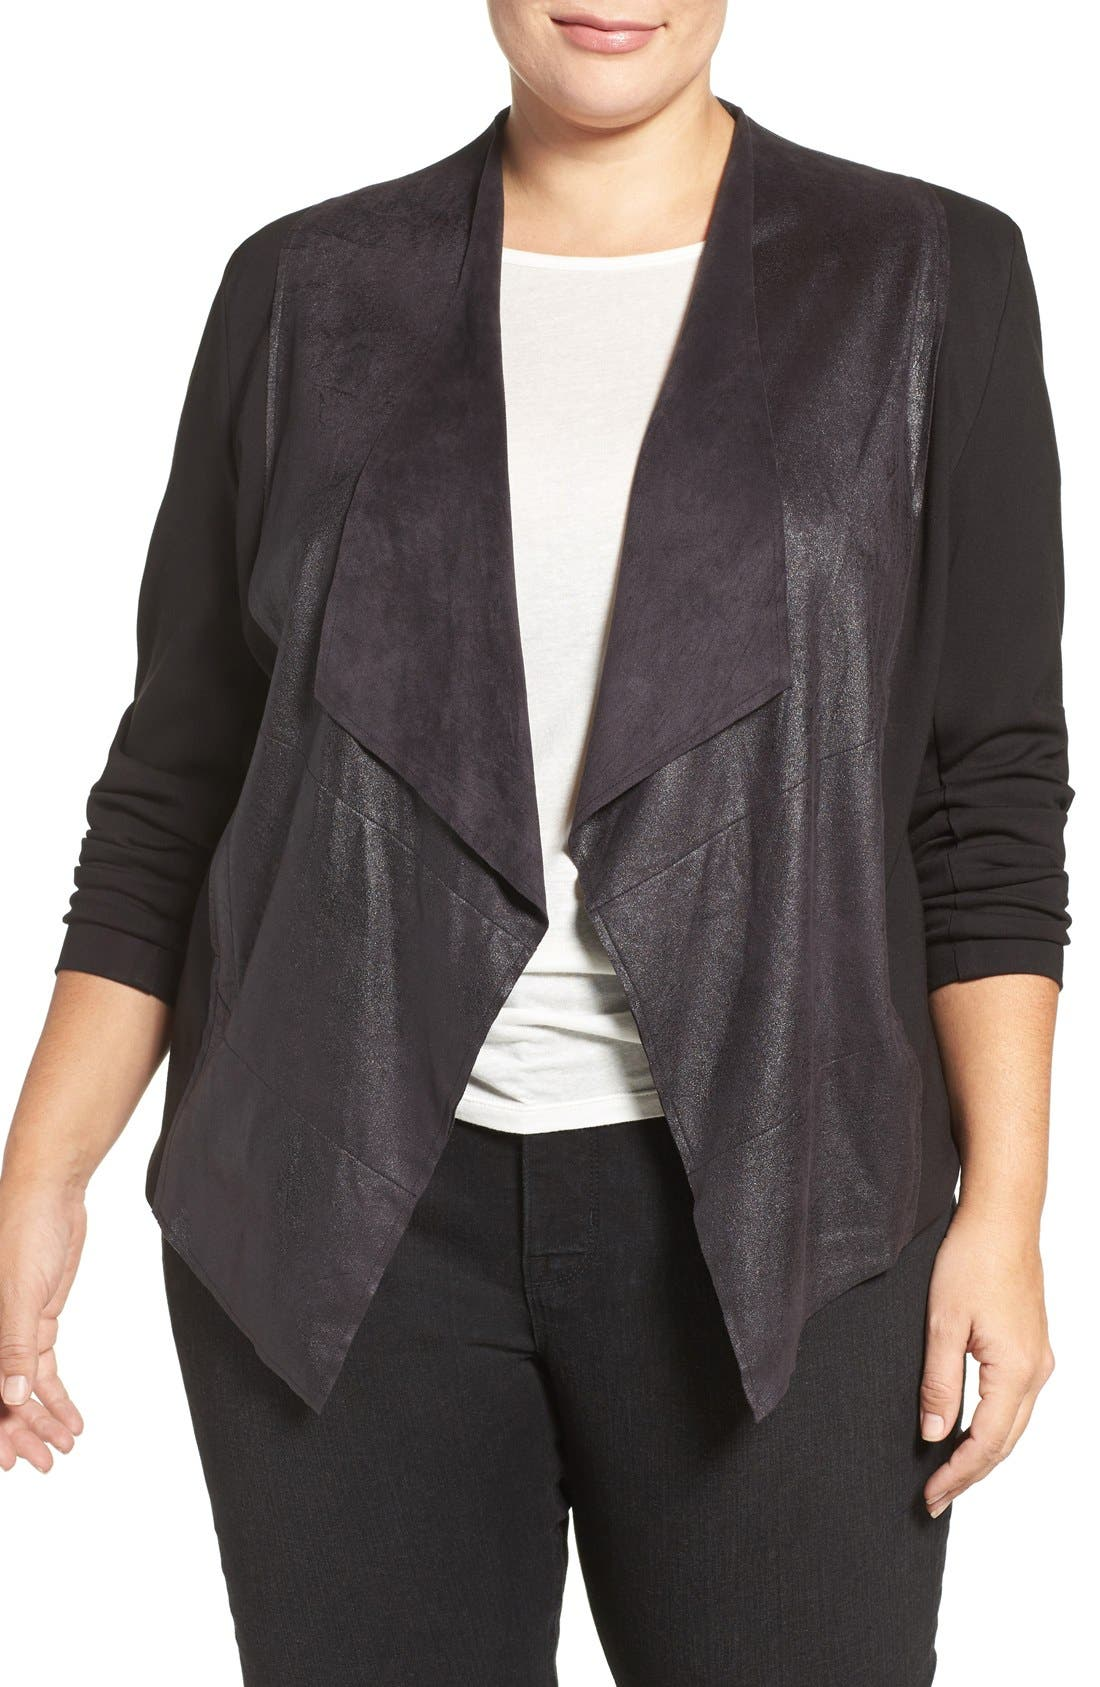 'Shanan' Faux Leather & Knit Drape Front Jacket,                             Main thumbnail 1, color,                             001